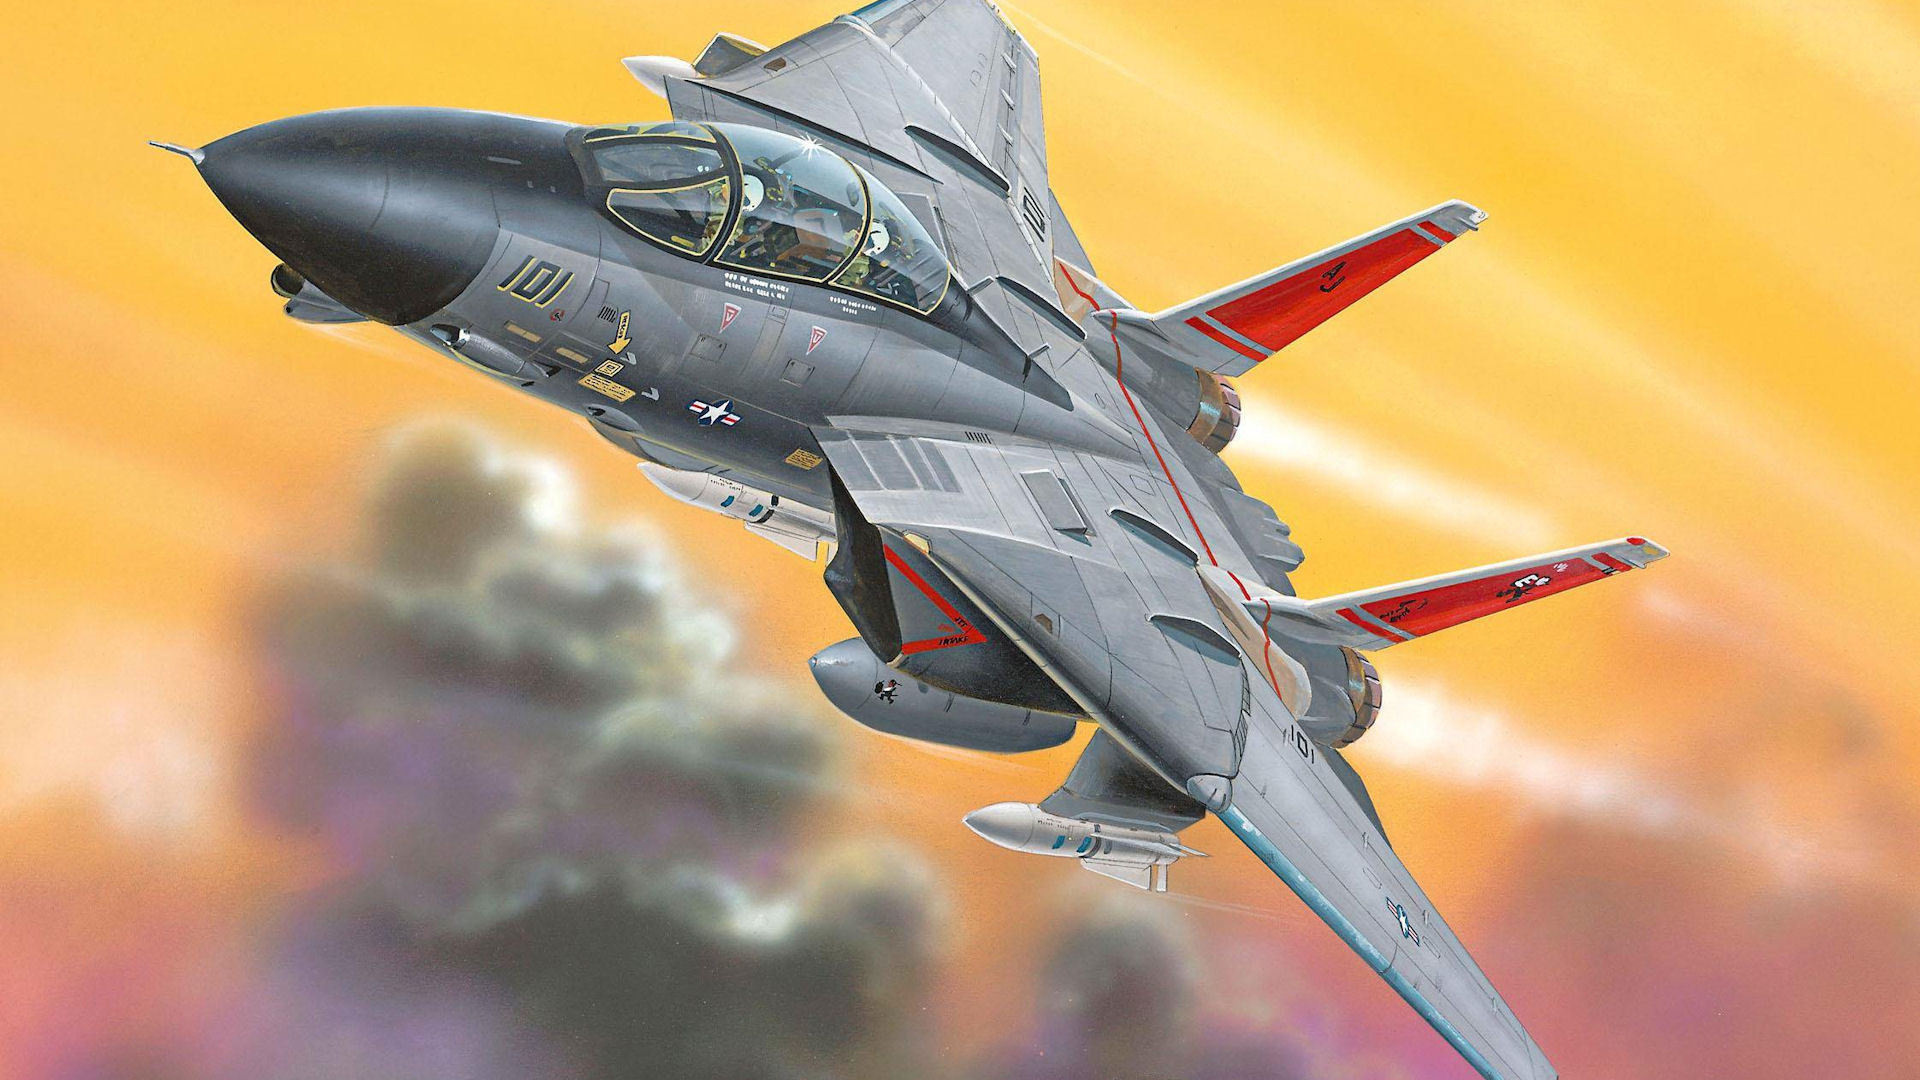 Res: 1920x1080, Grumman F-14 Tomcat Wallpapers 7 - 1920 X 1080